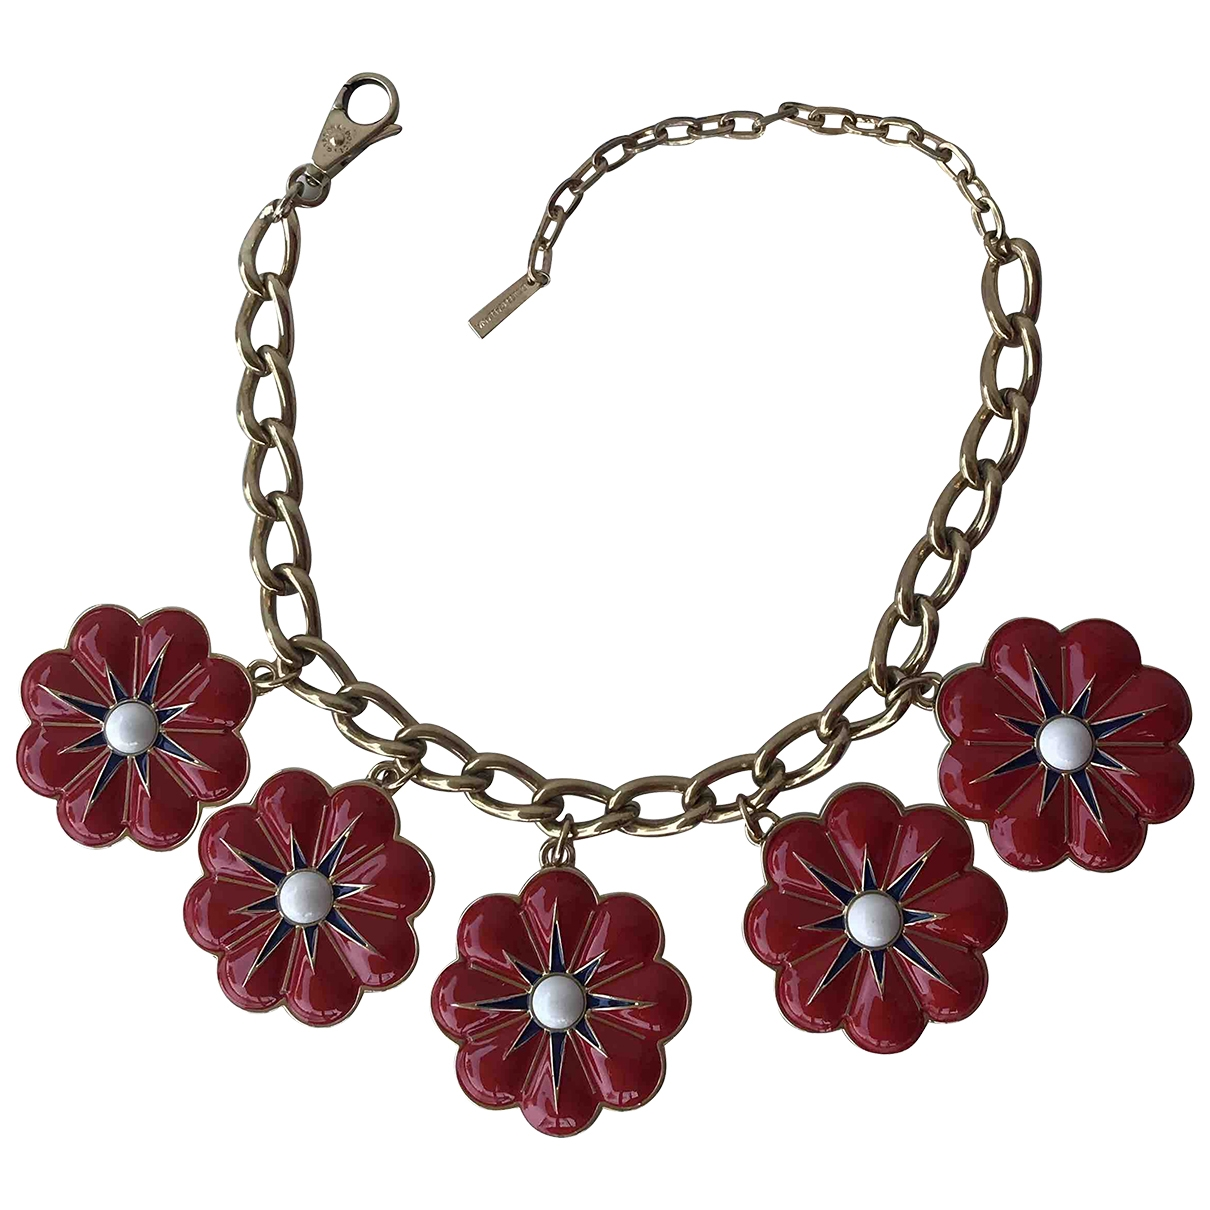 Dolce & Gabbana \N Kette in  Bunt Metall